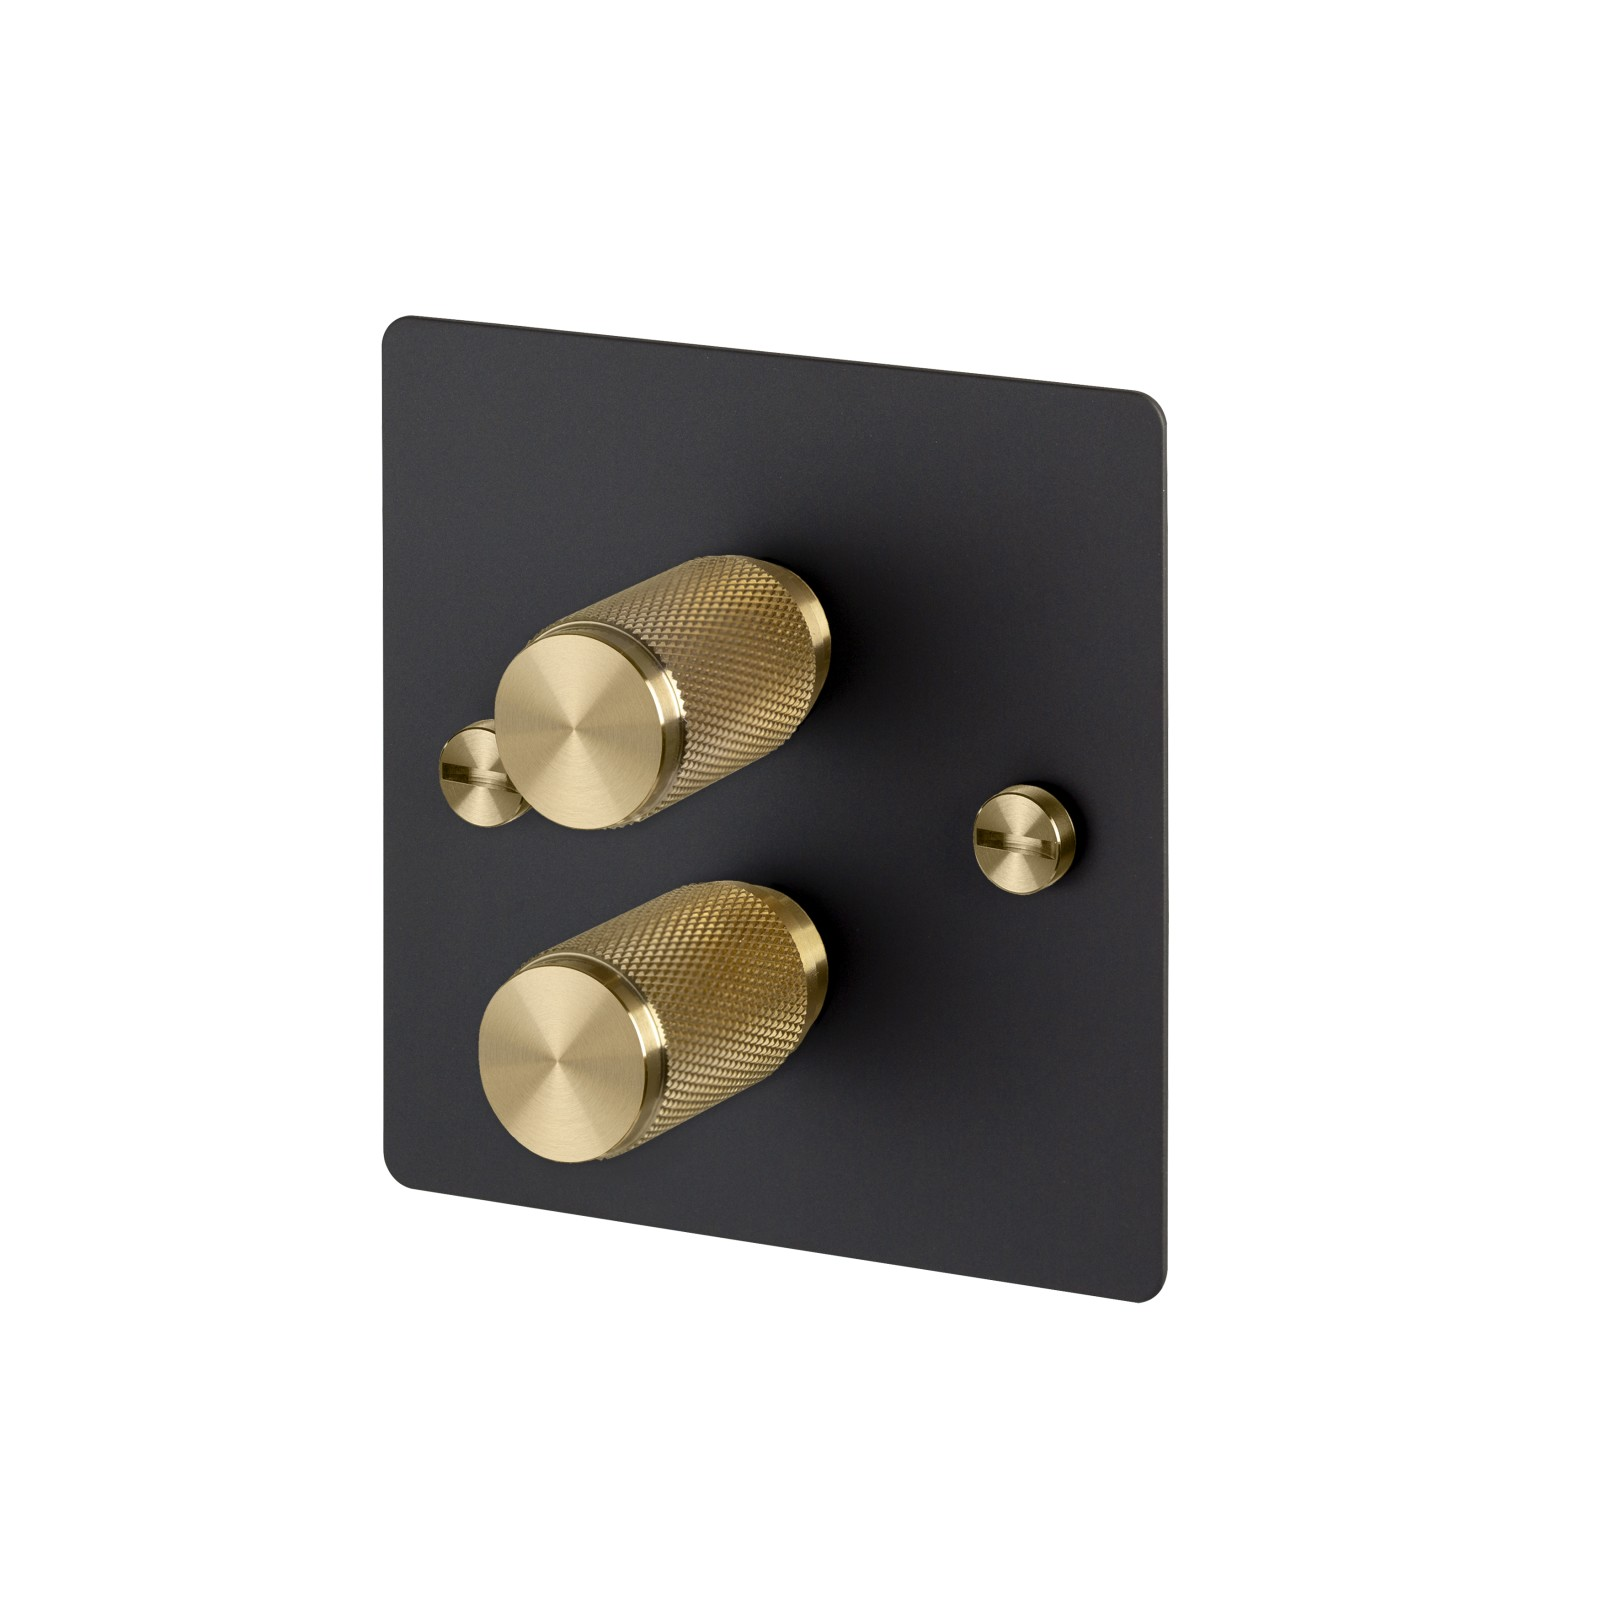 2G Dimmer Switch 2G Dimmer / Black / Brass